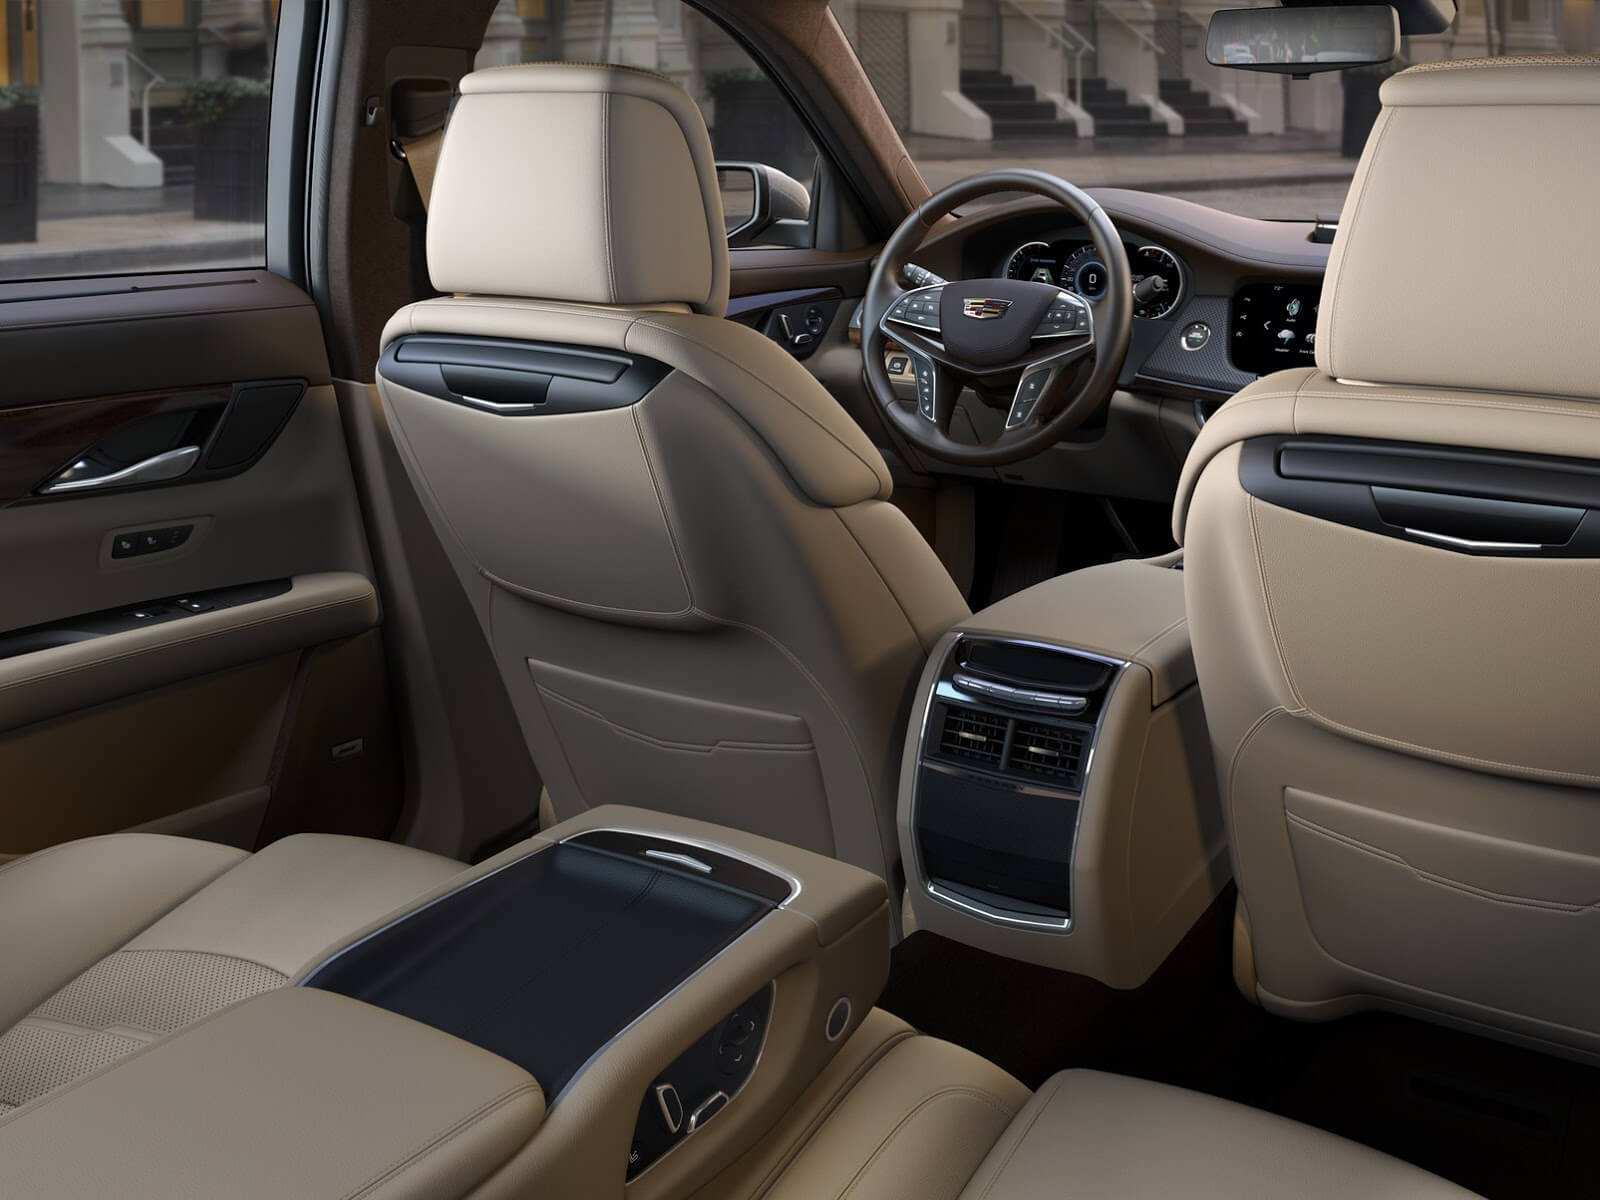 97 Concept of 2019 Cadillac Ct8 Interior Specs for 2019 Cadillac Ct8 Interior